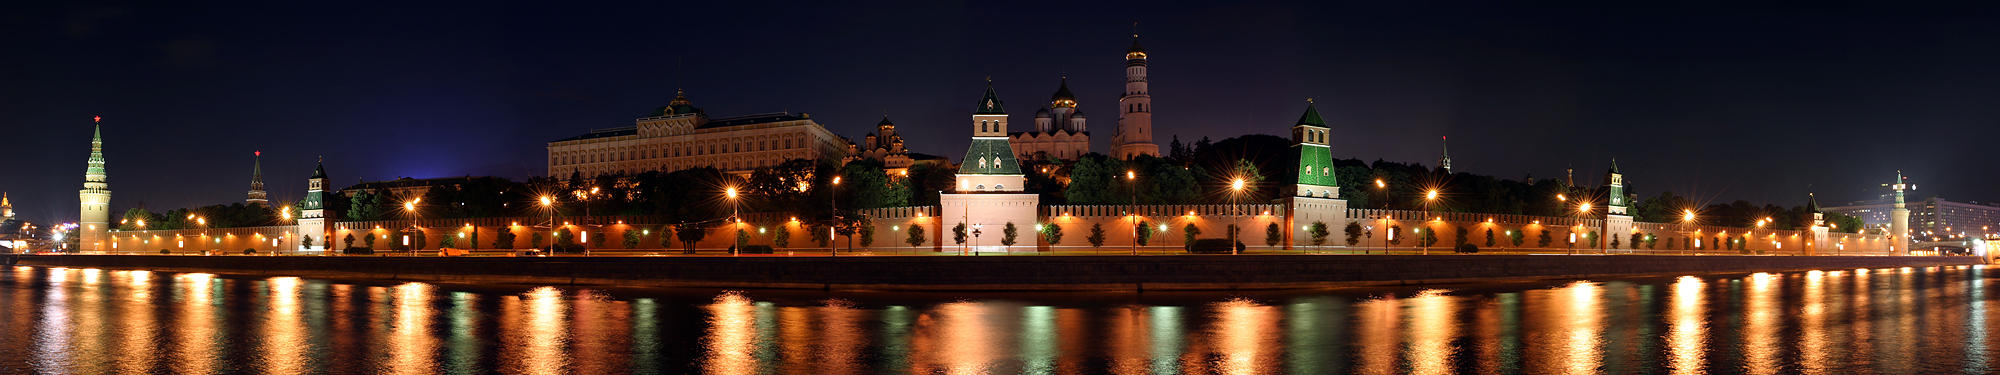 Panorama of Moscow Cremlin